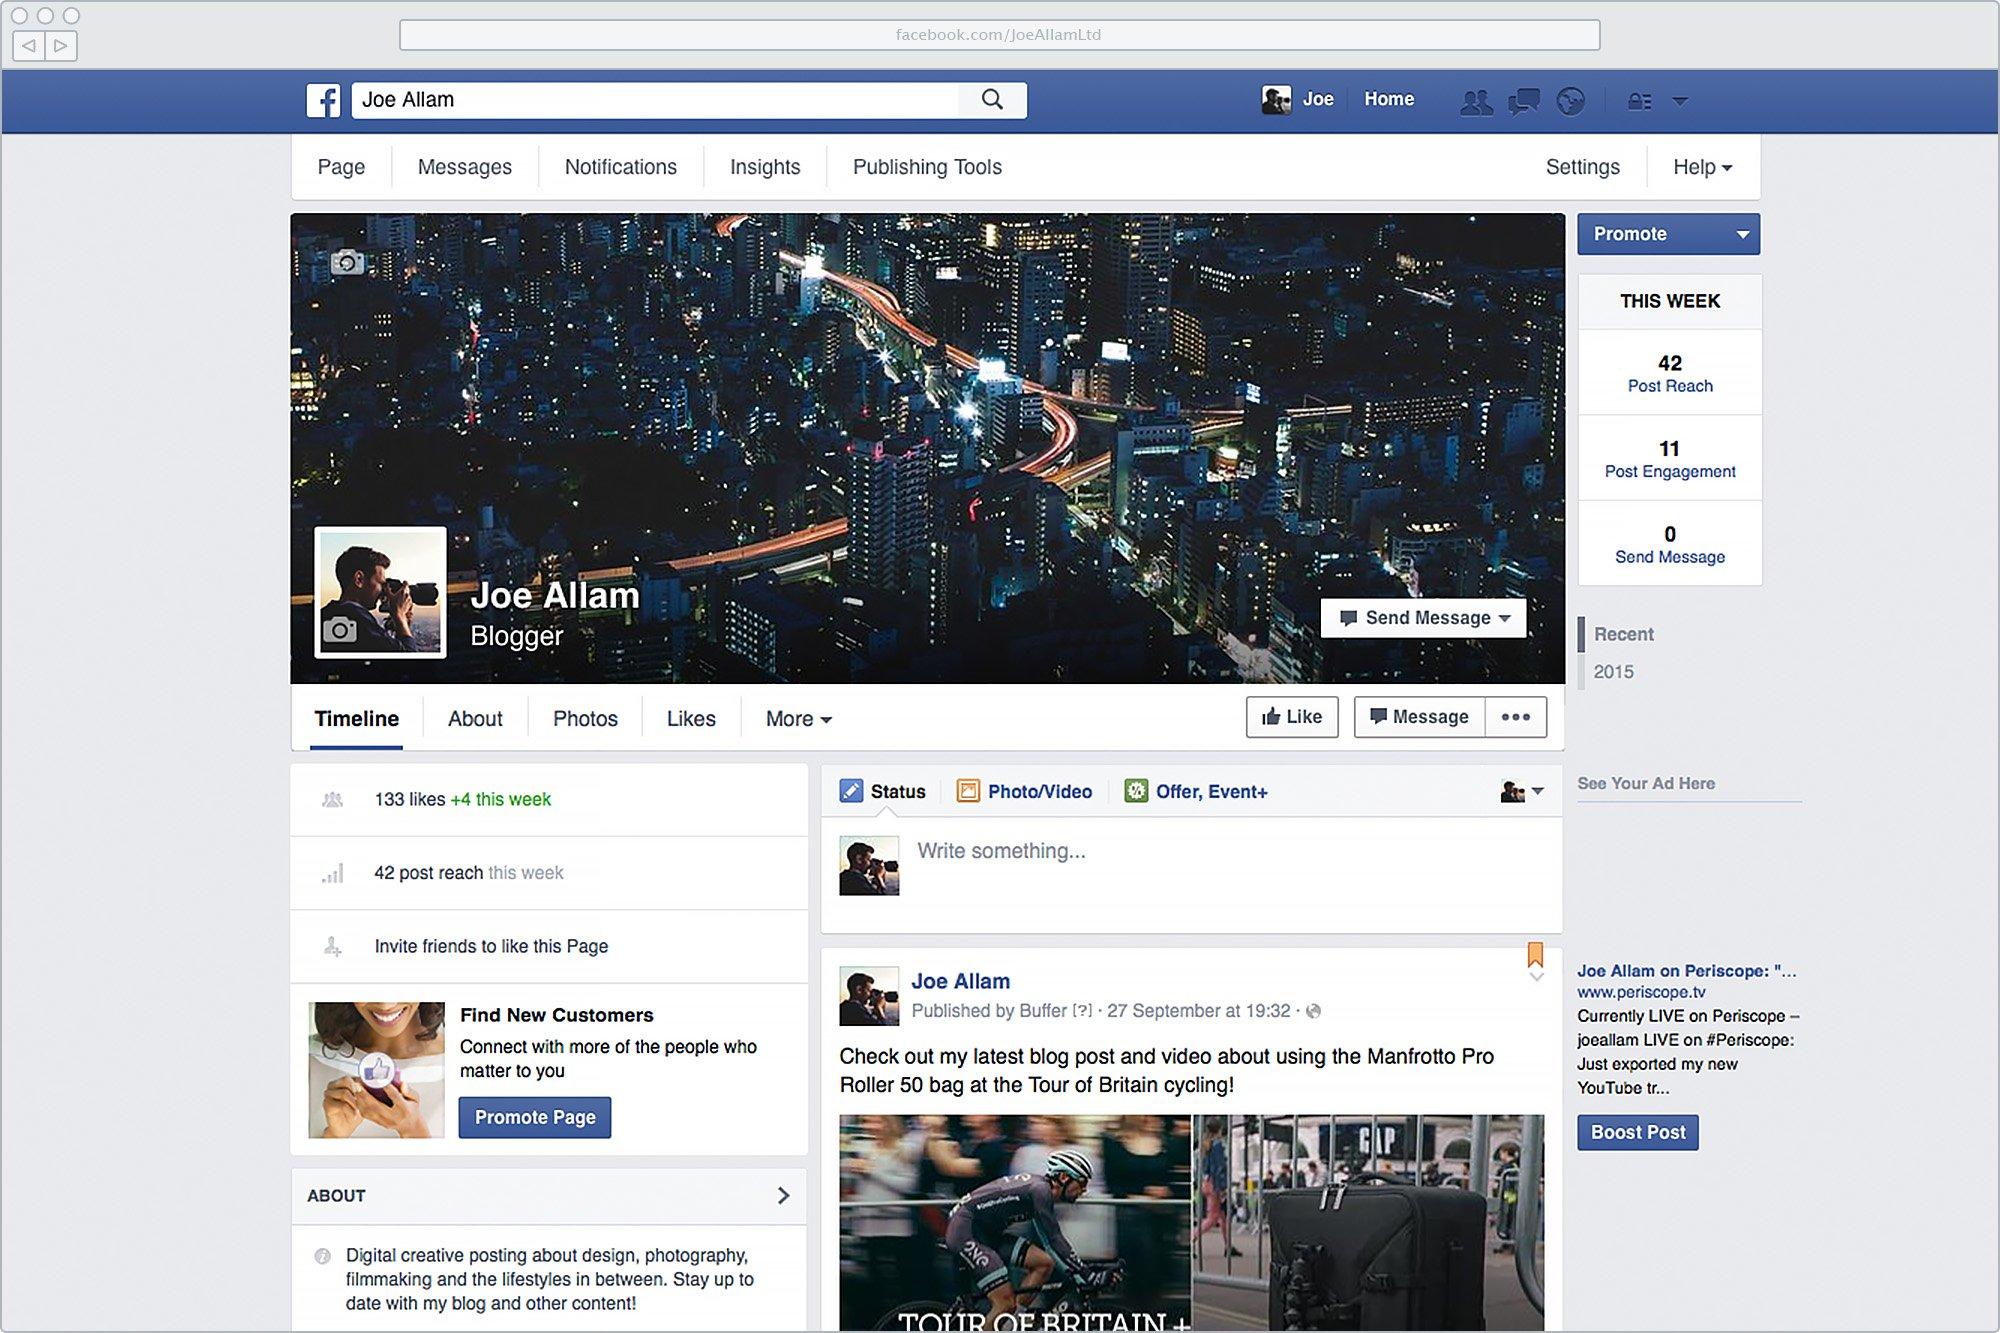 Old Facebook Branding